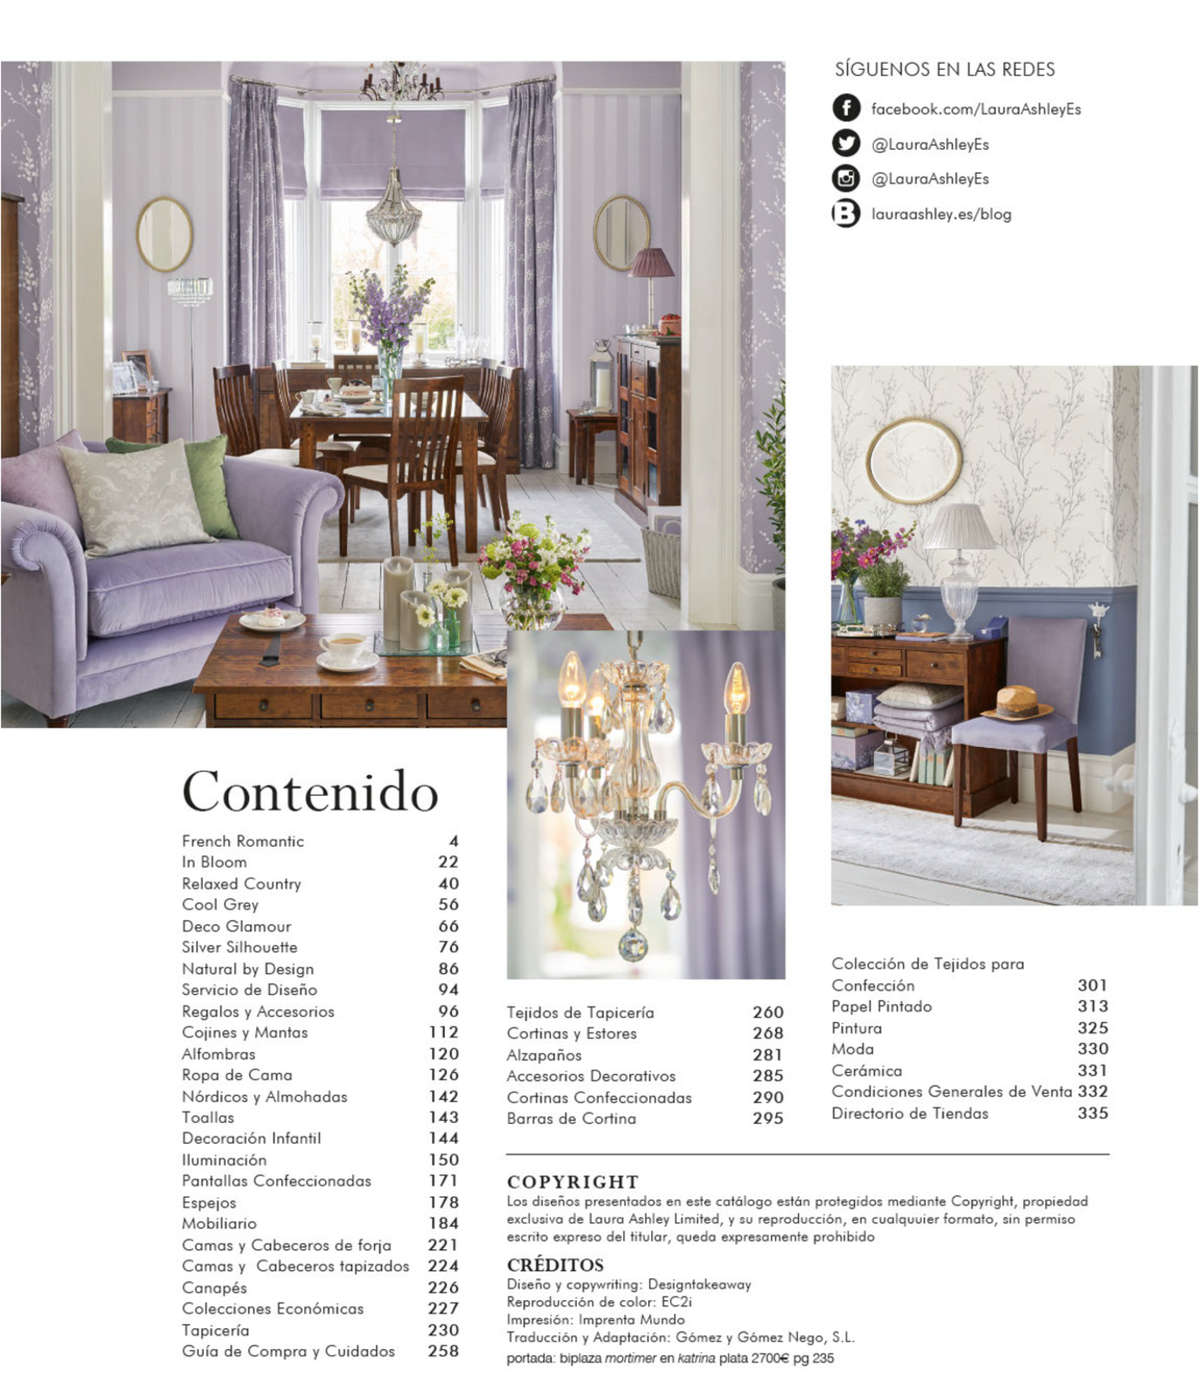 Laura Ashley Segovia - Ofertas, catálogo y folletos - Ofertia